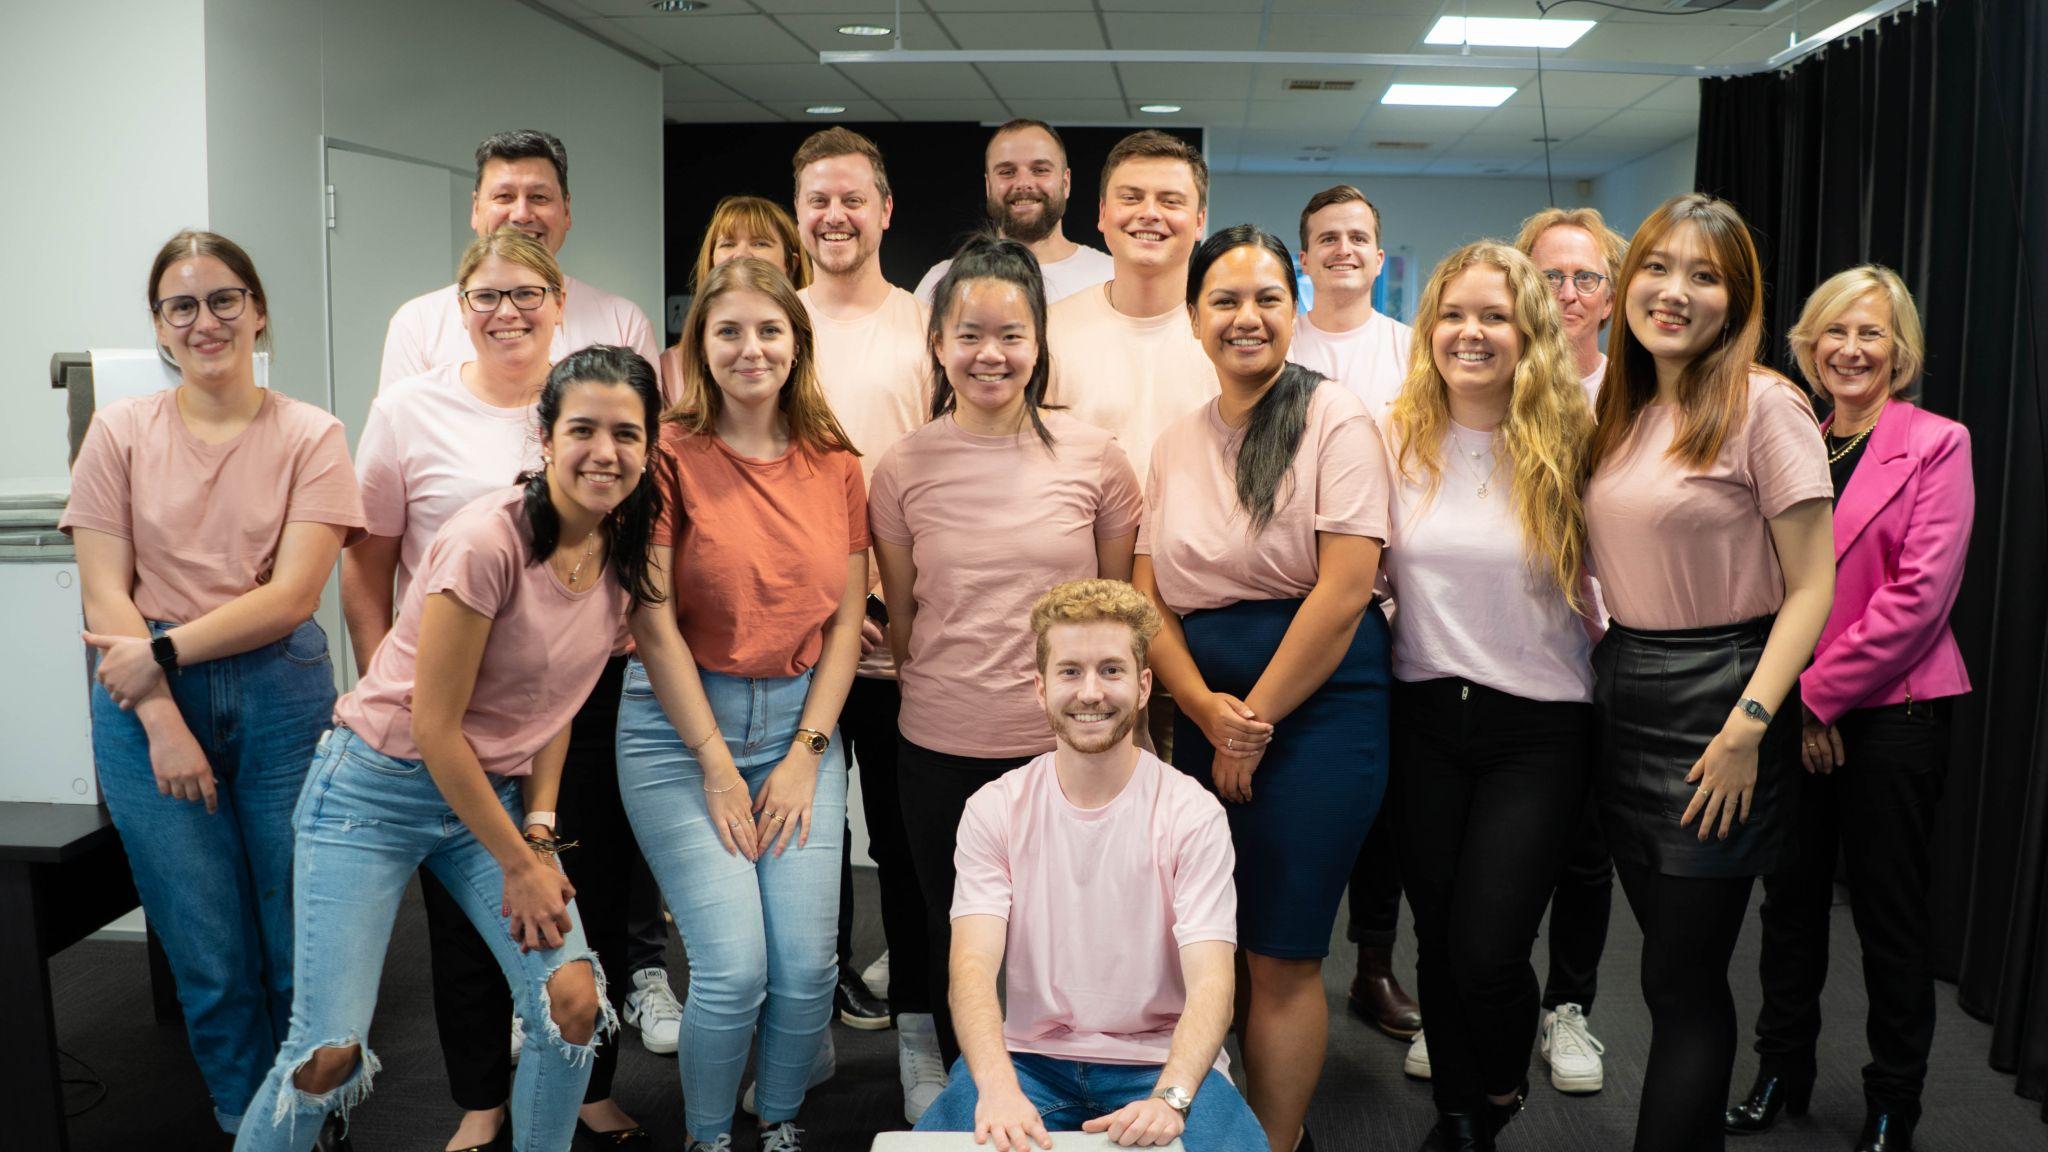 Capability Group - New Zealand office employees